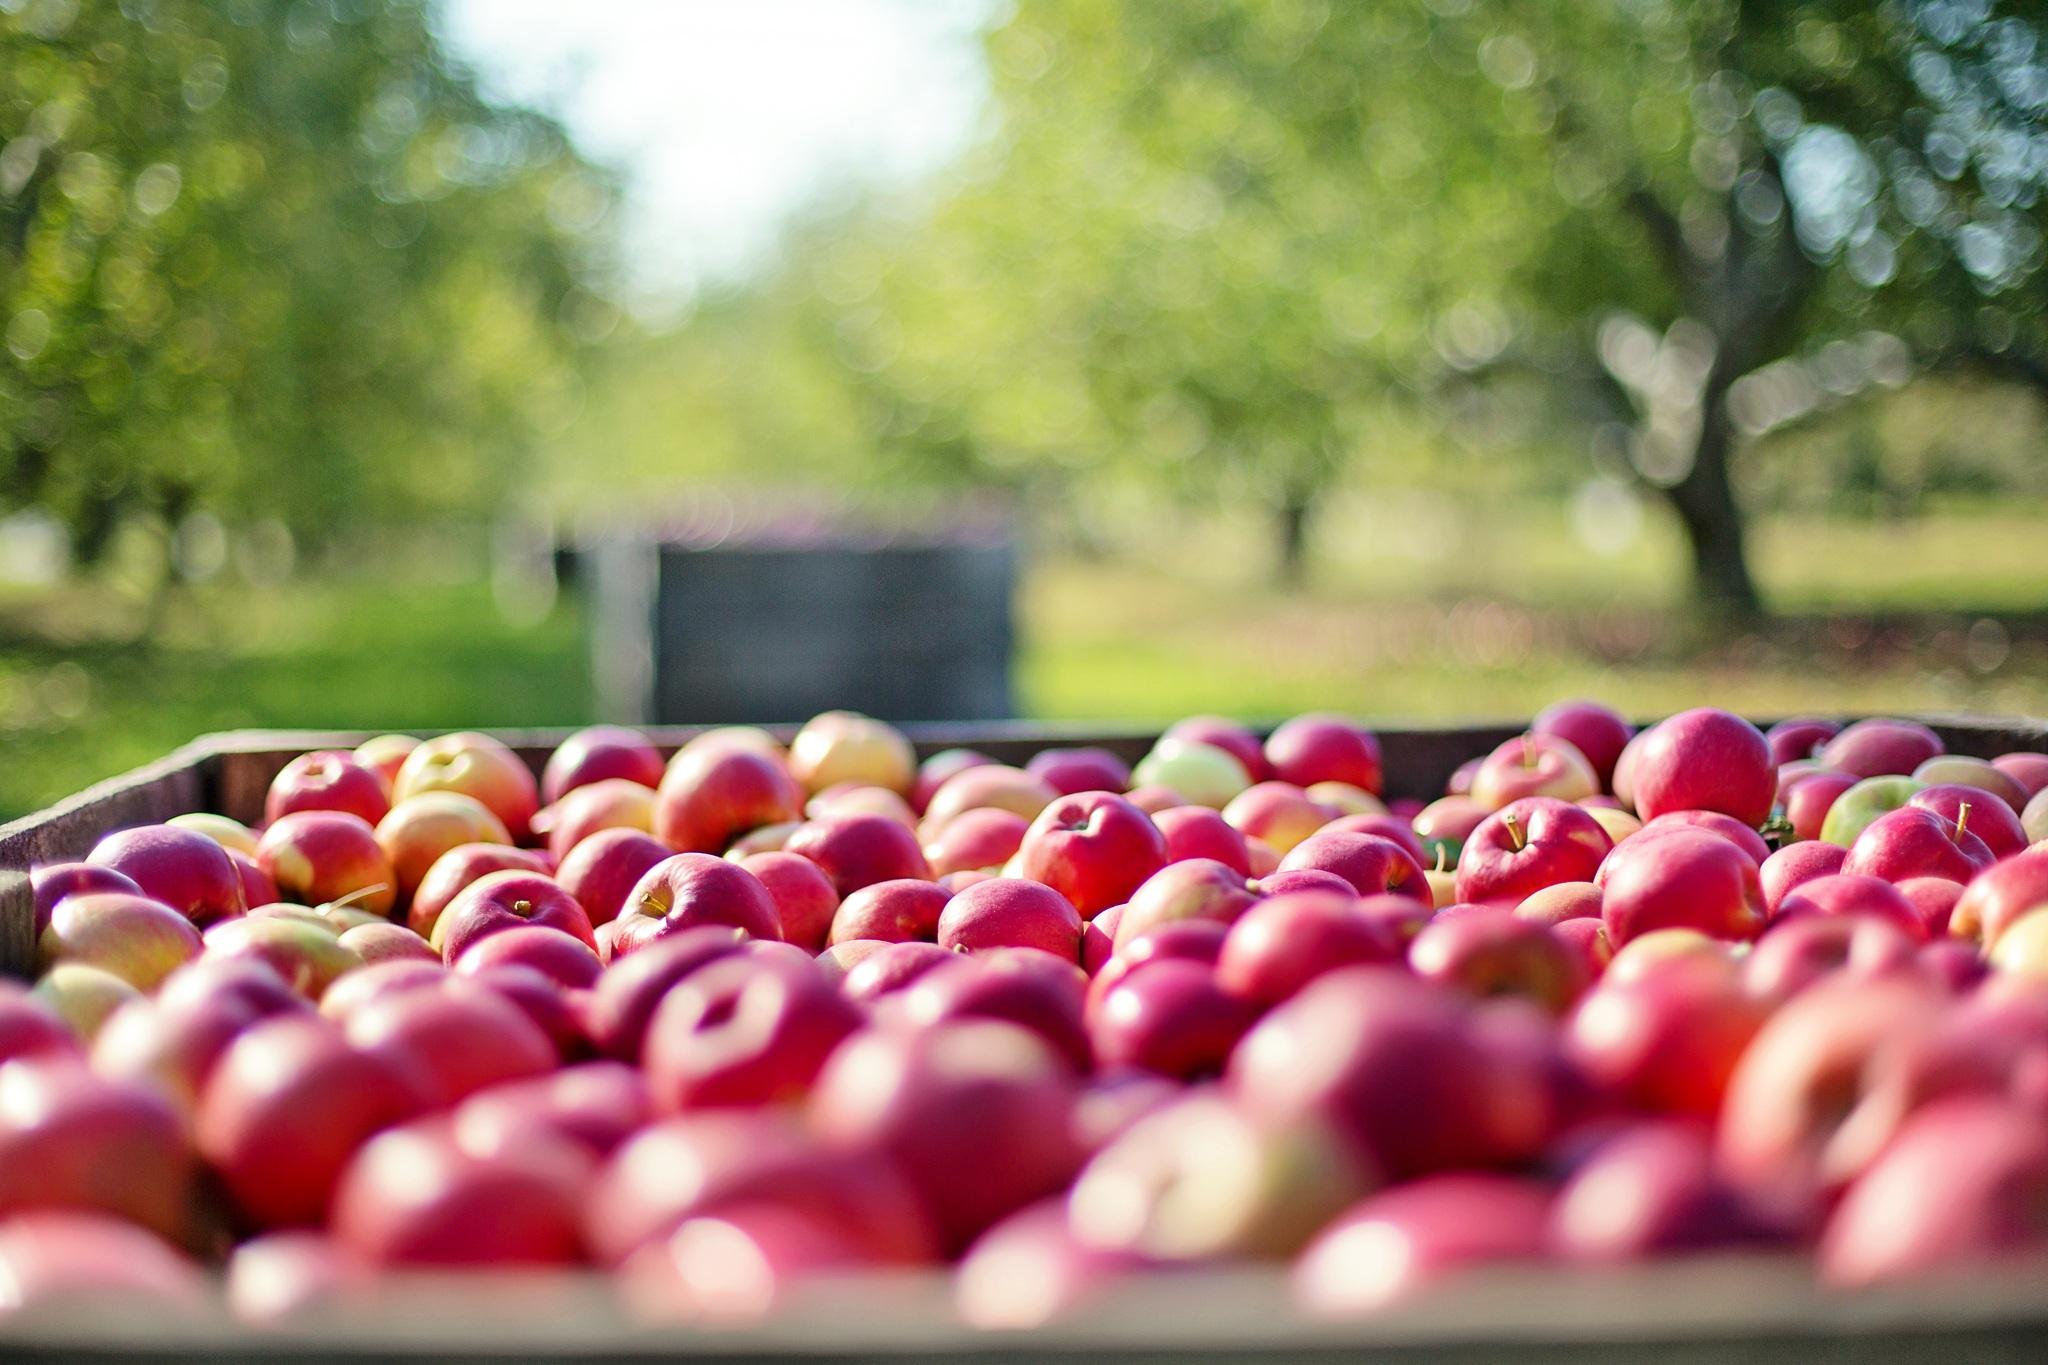 Embargo jabłka